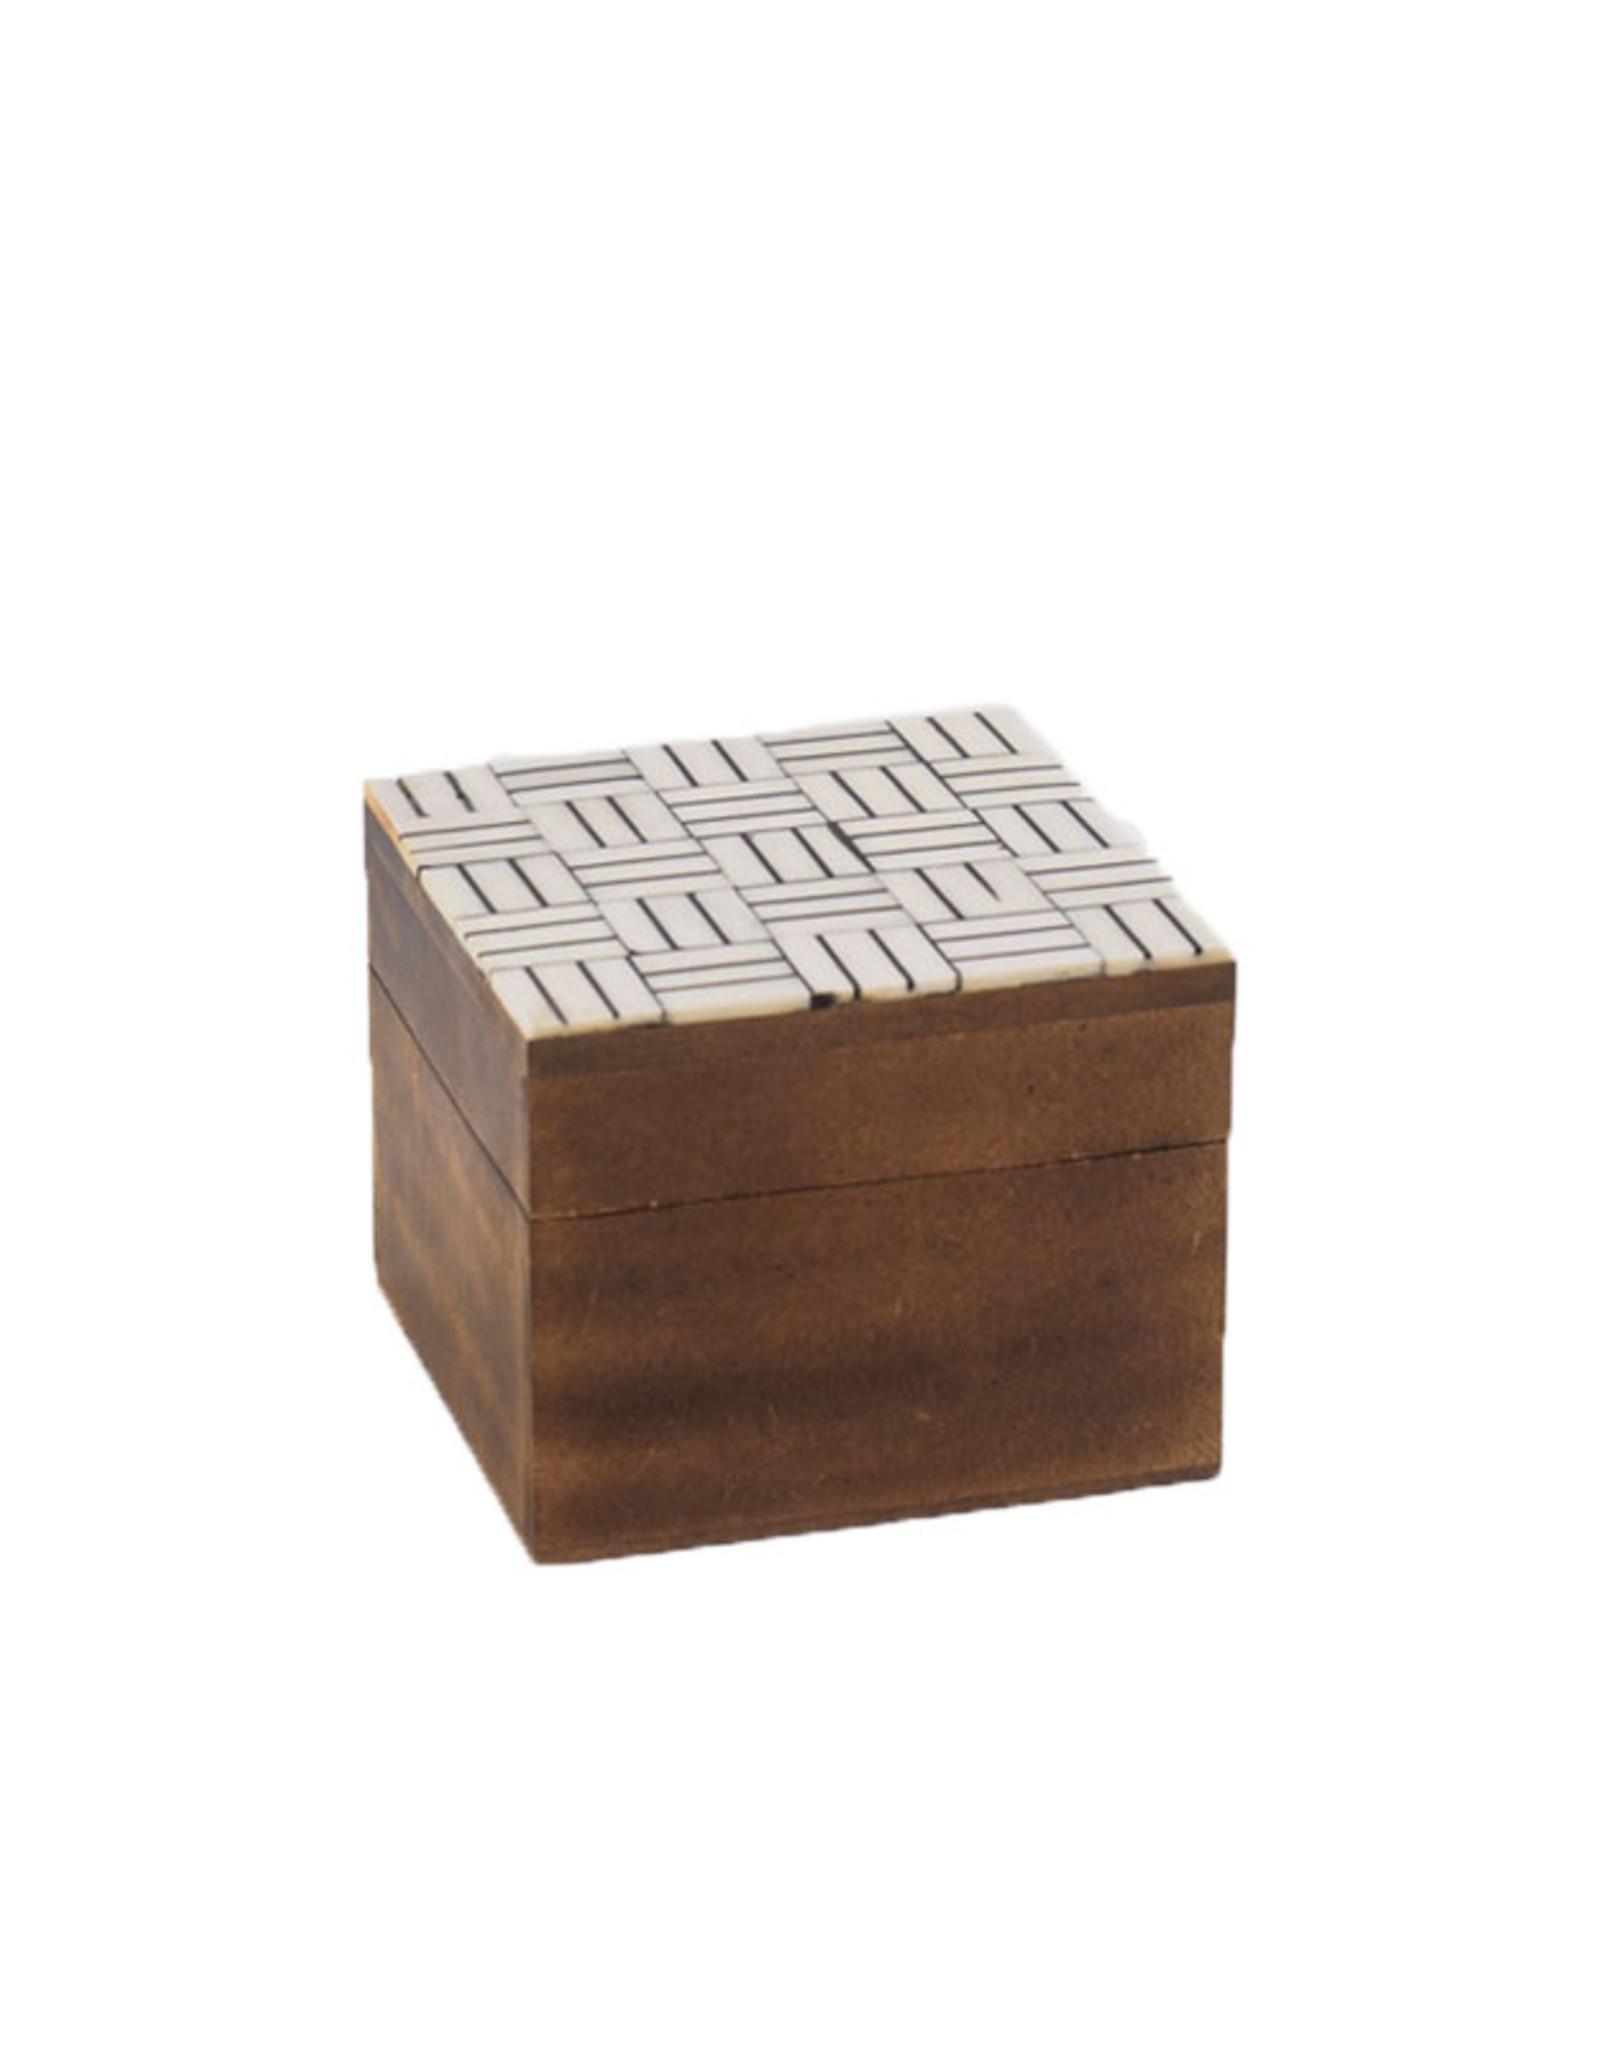 Horgans Natural & Black Bone Top Square Box